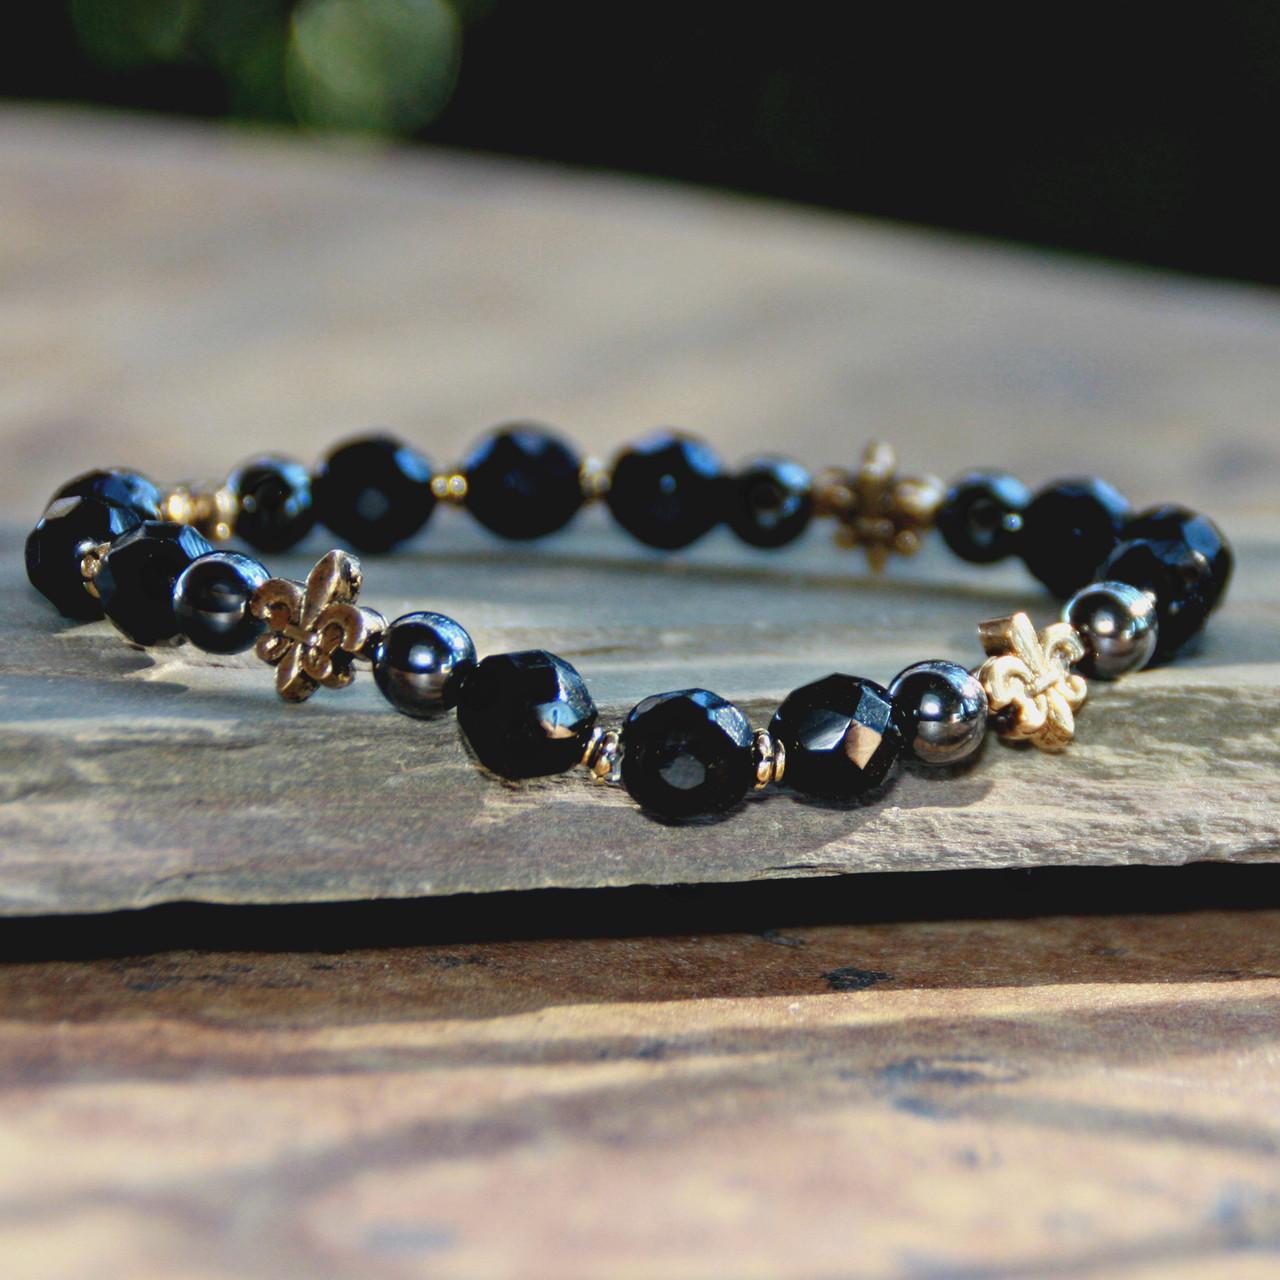 NOST-7  Black and Gold Stretchy Bracelet